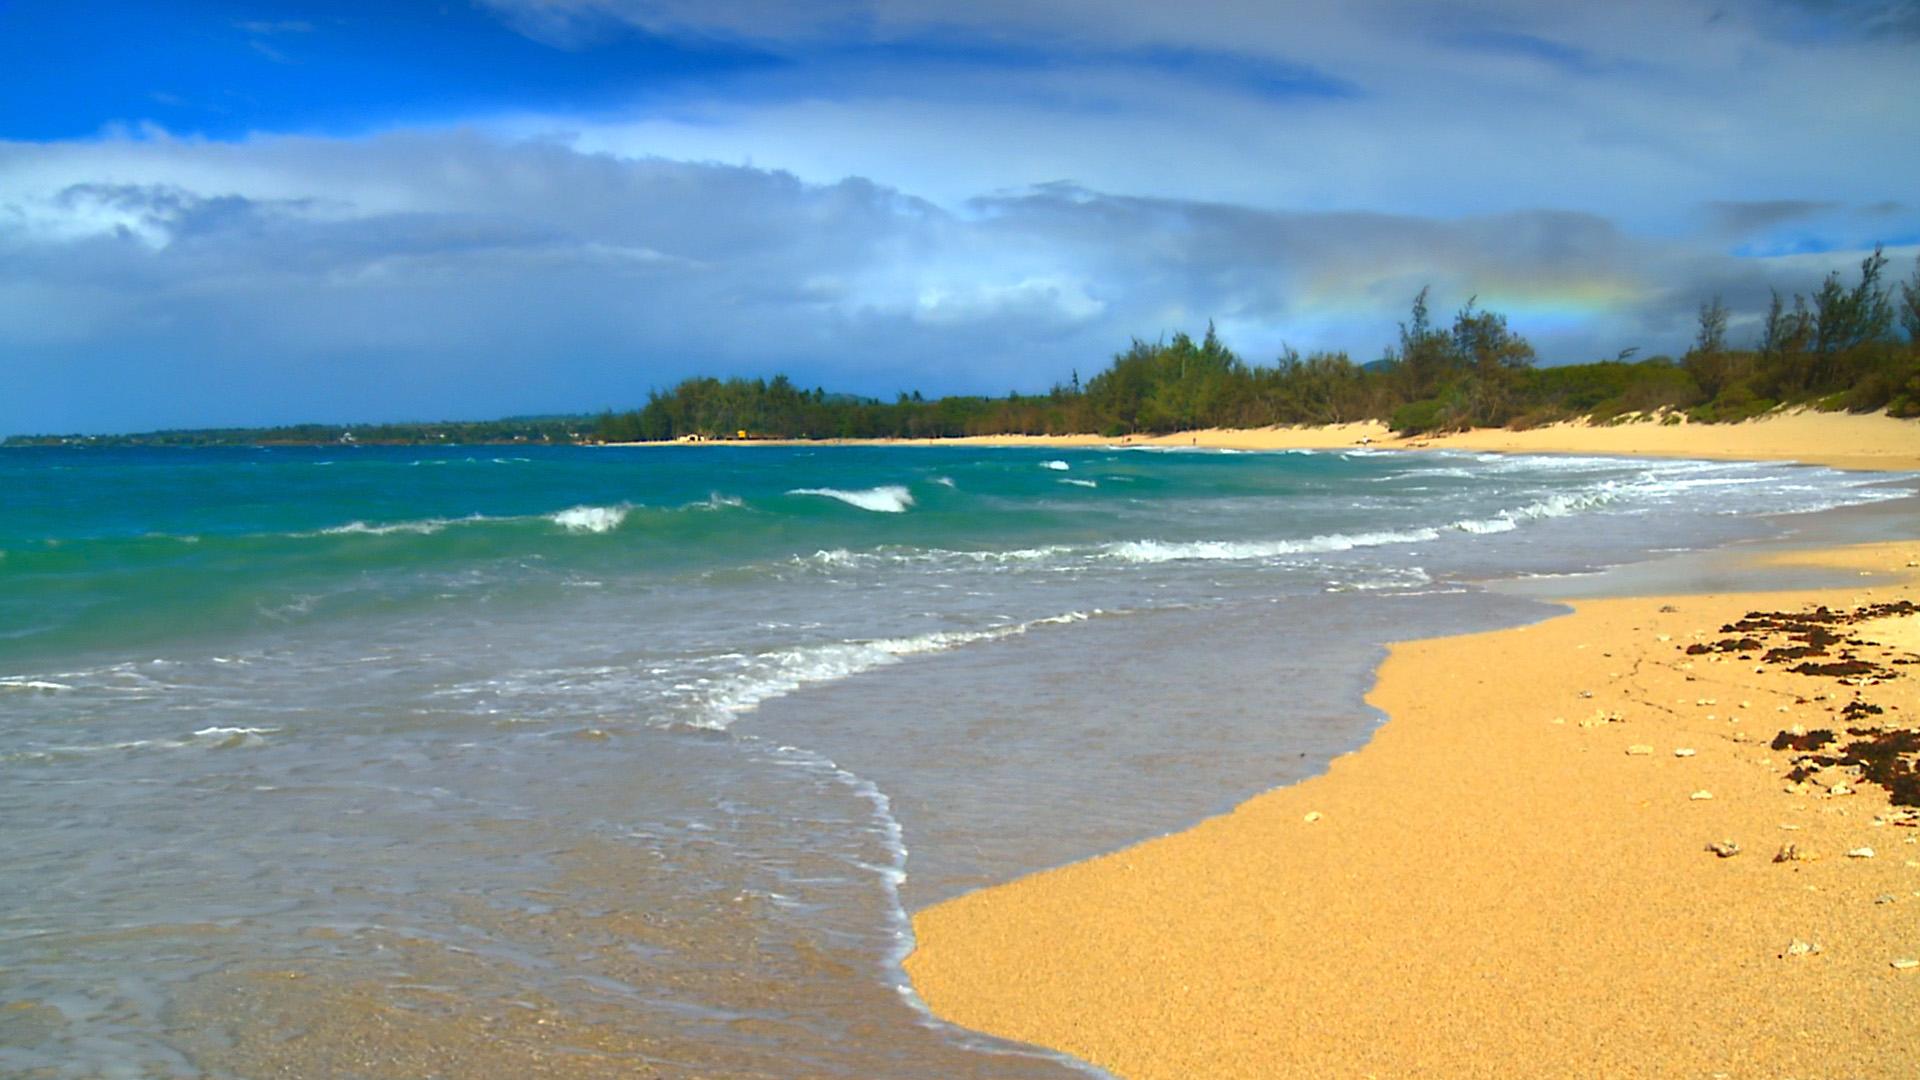 Ipad Wallpaper Beach Scenes: Free Hawaii Screensavers Wallpaper